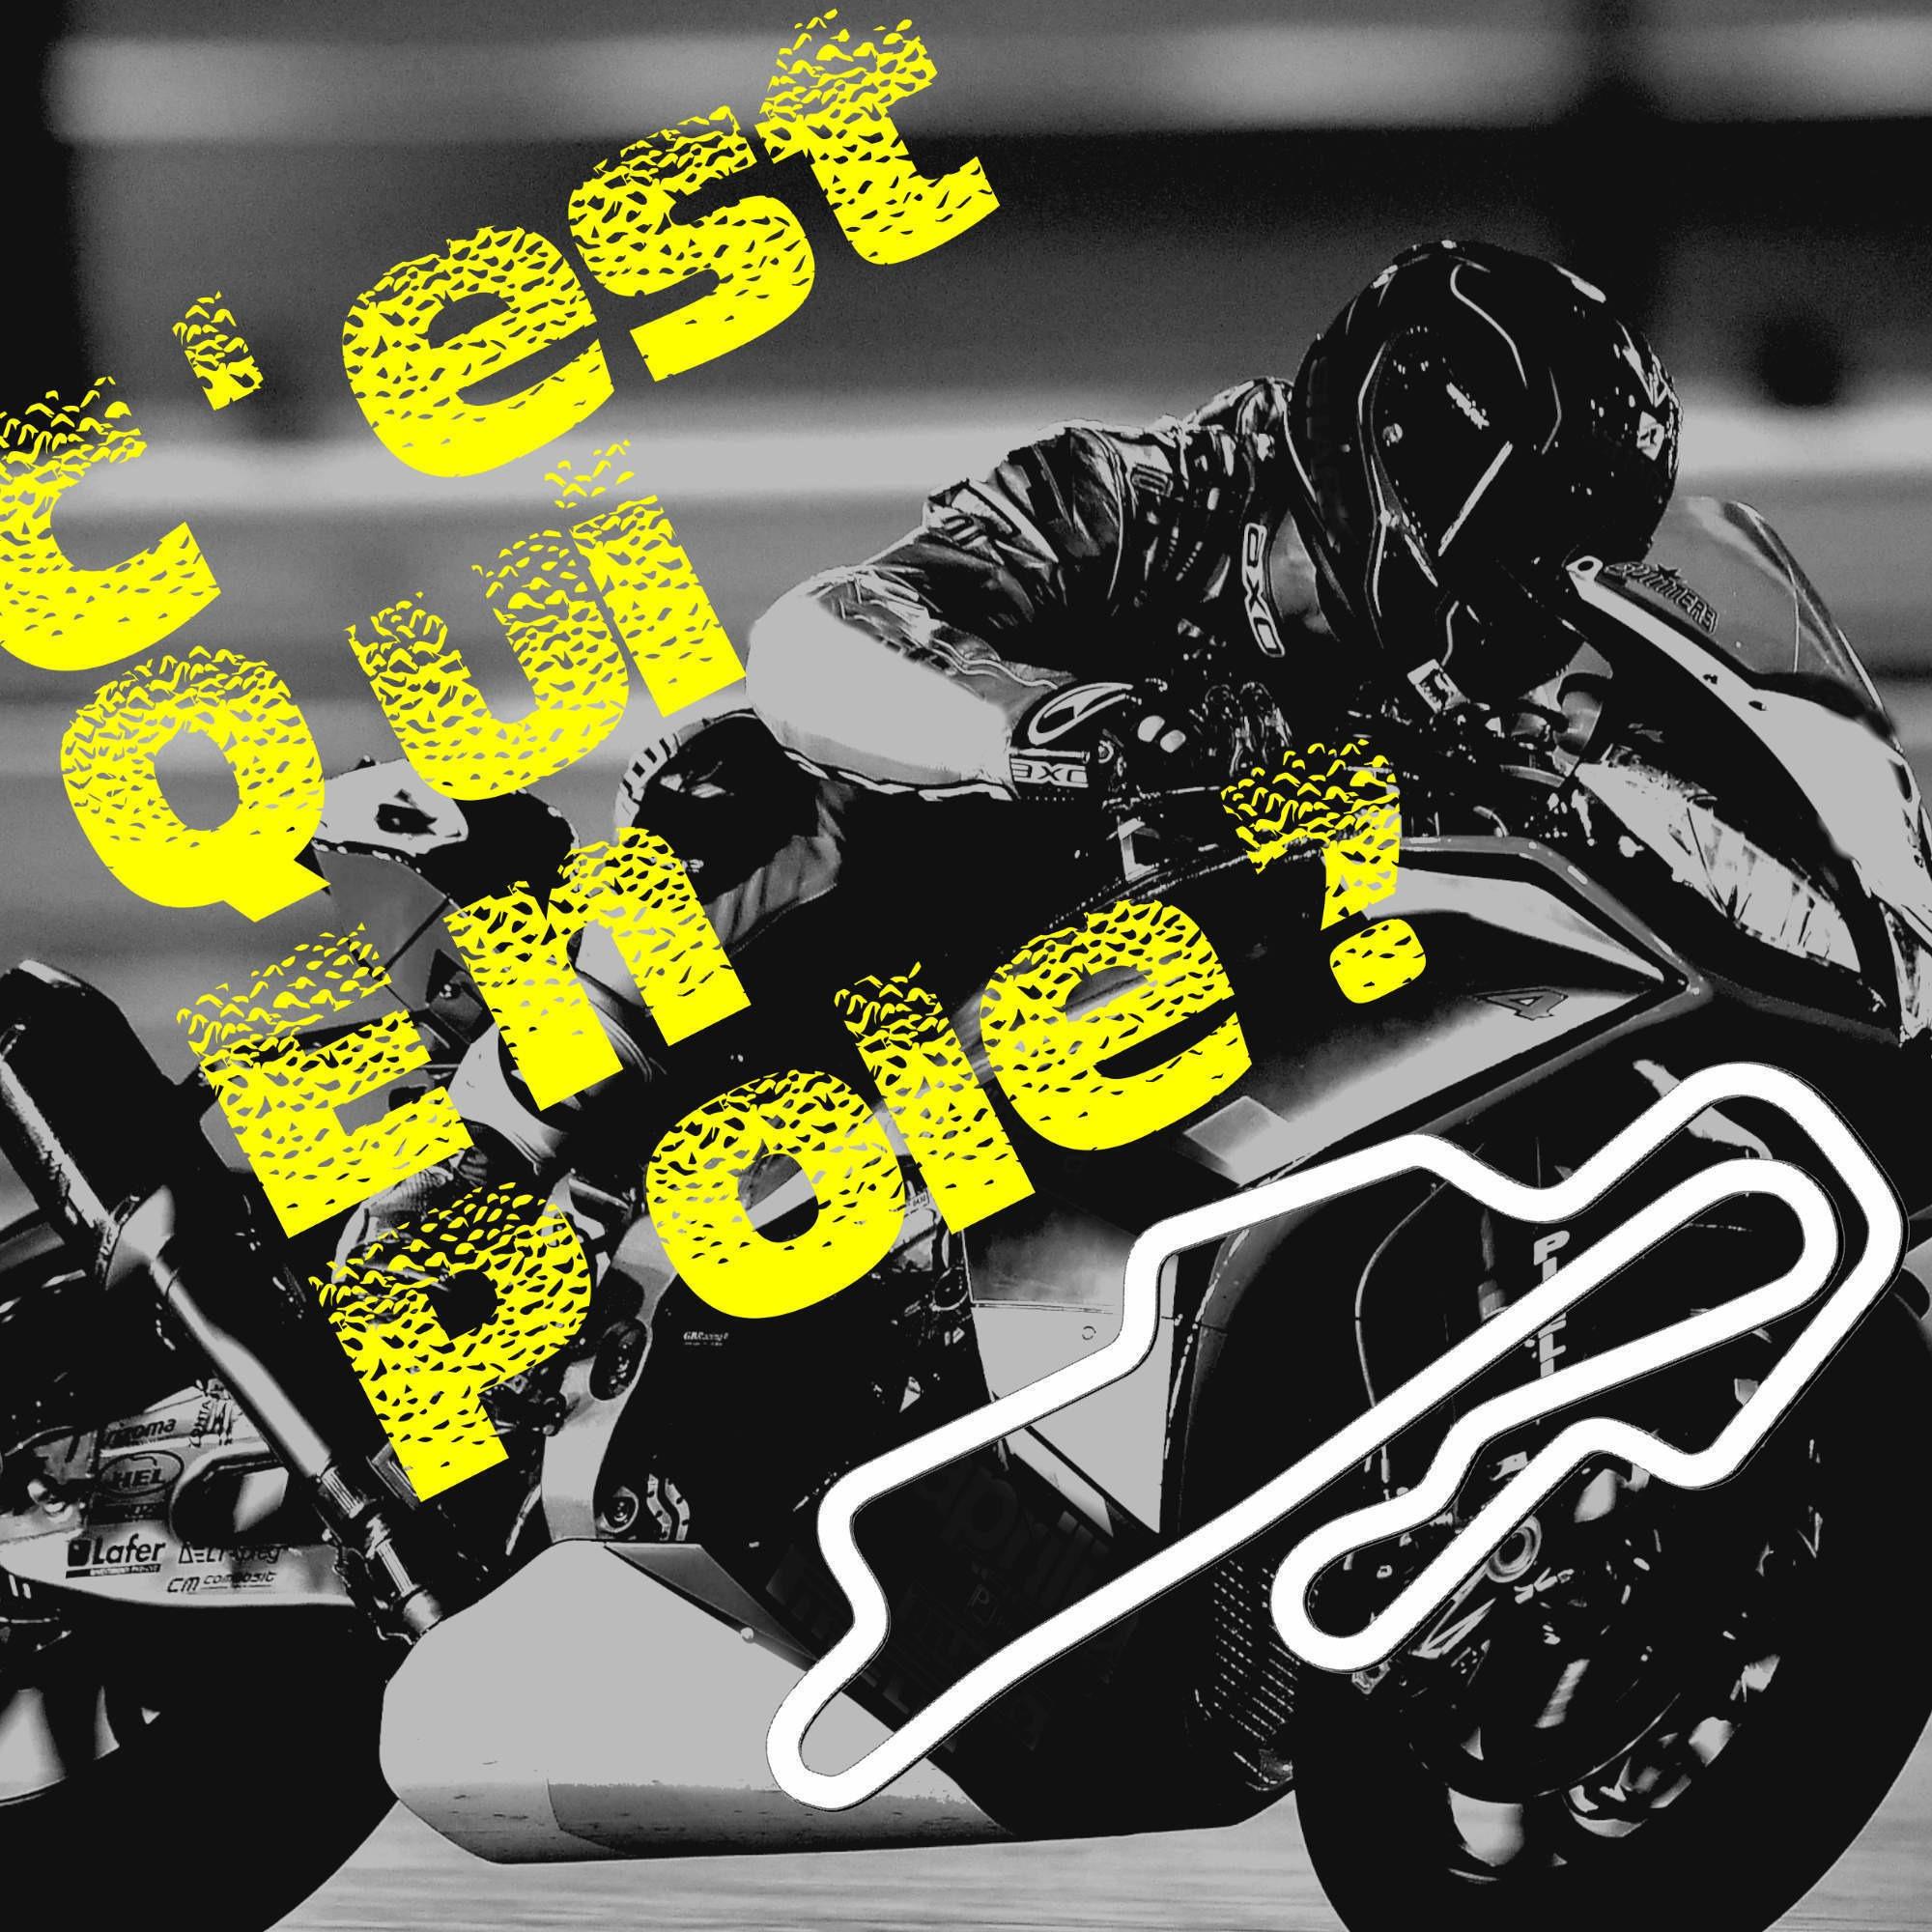 CQEP - 86 - Debrief Moto2 Moto3 MotoE - Saison 2020